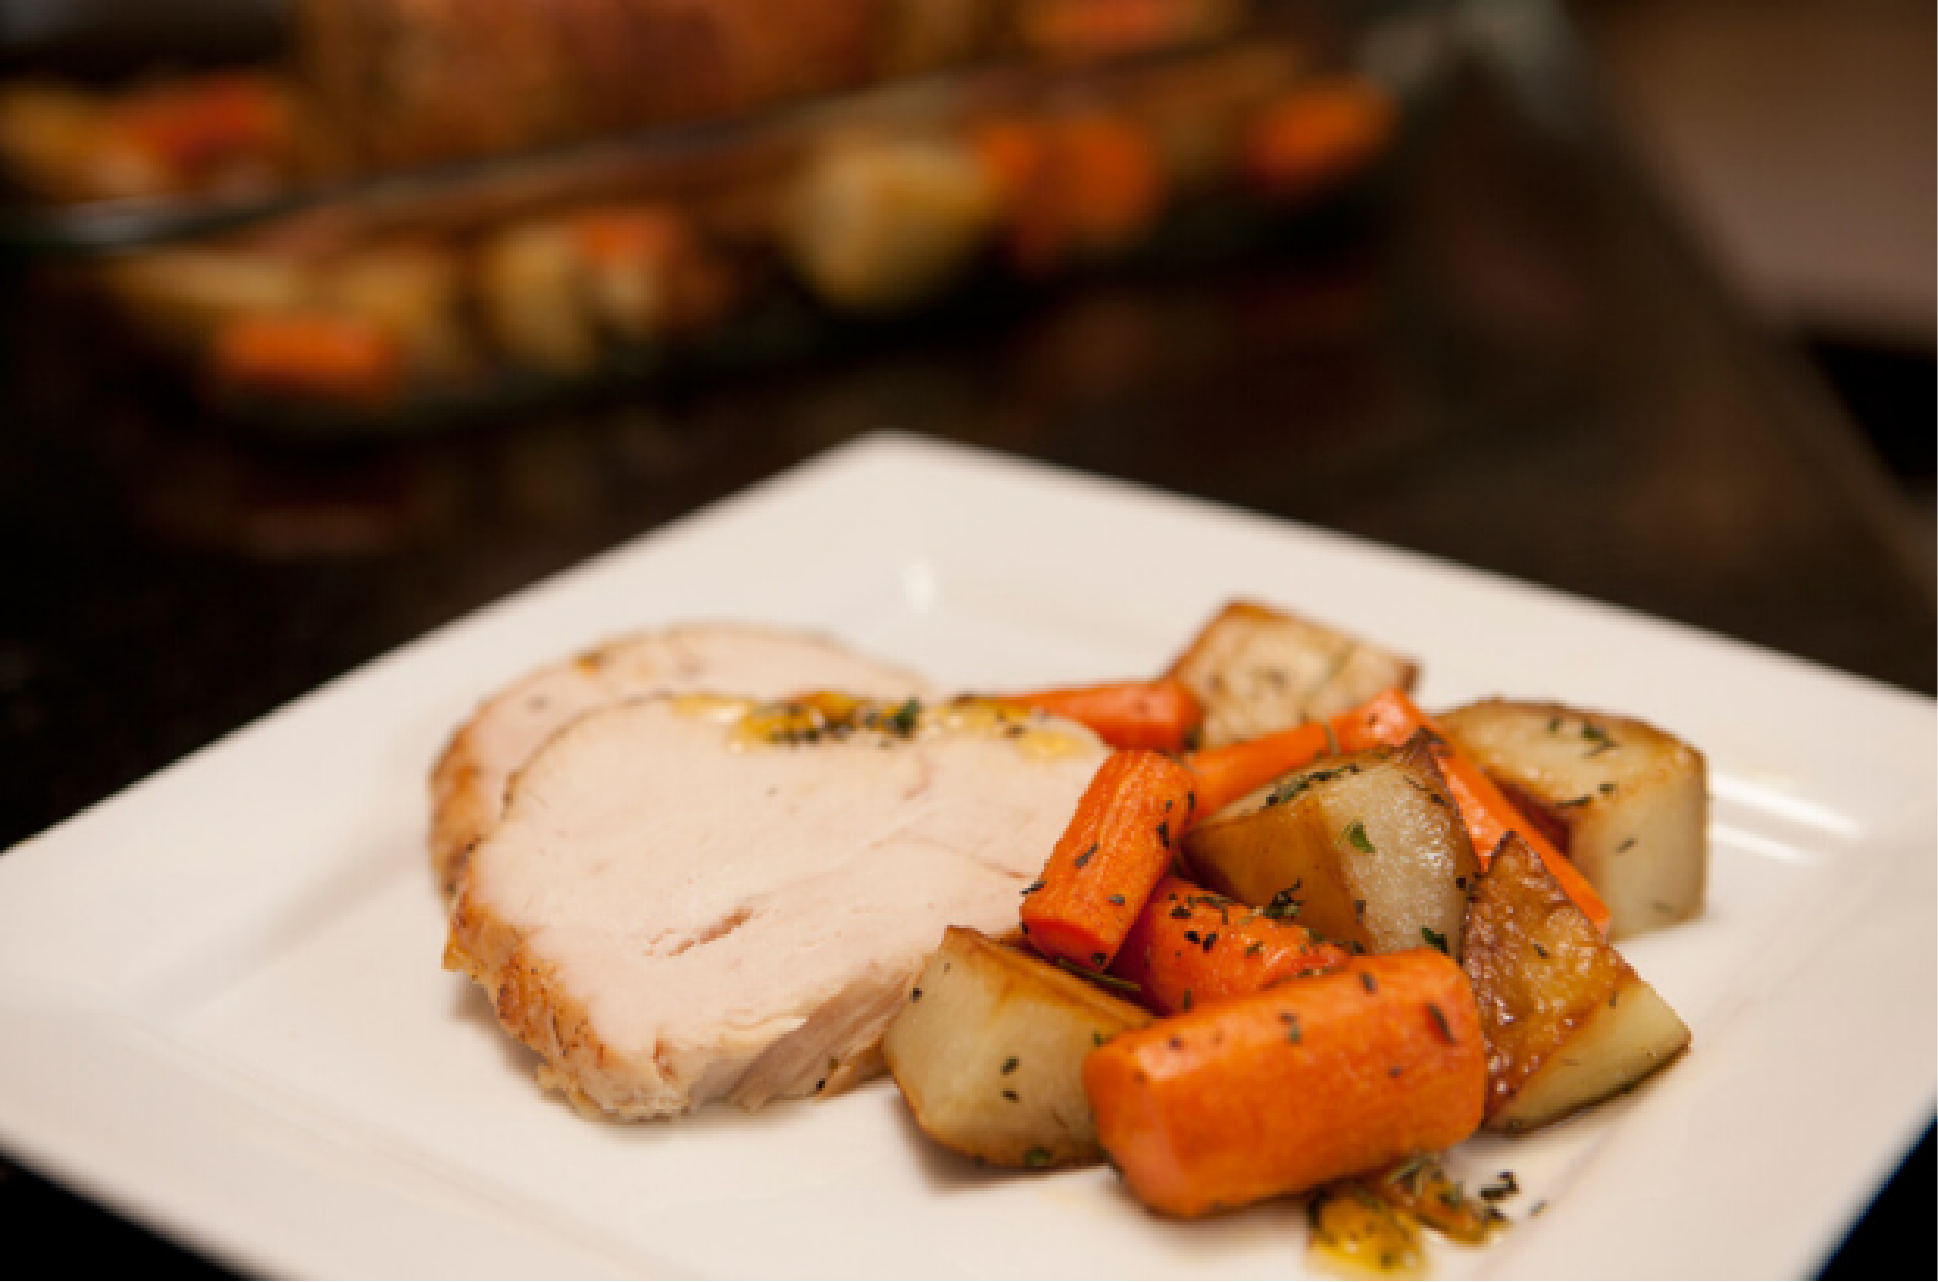 Recipe of the Month: Orange Glazed Turkey with Potatoes & Carrots